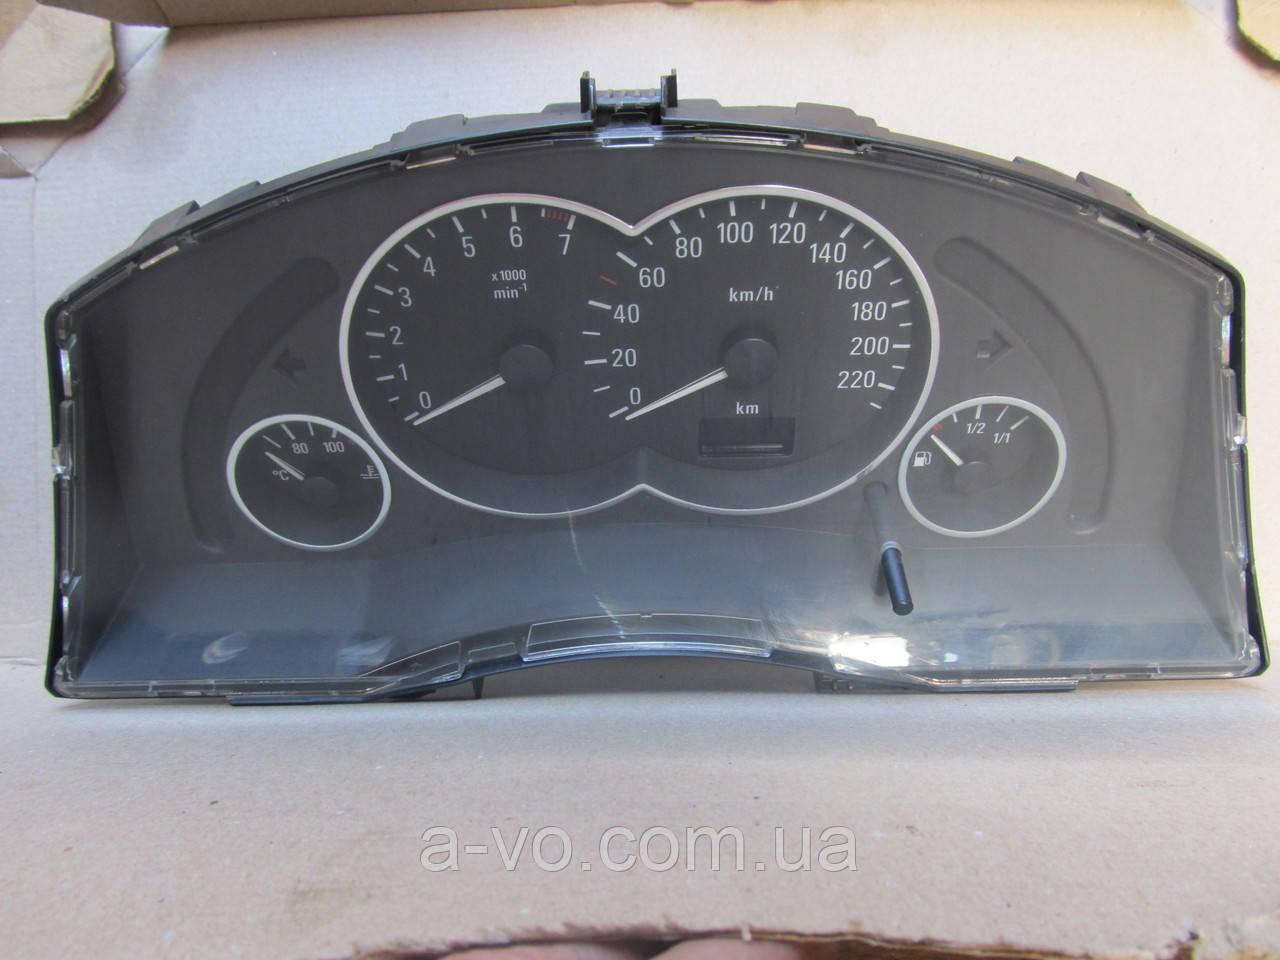 Панель приборов спидометр для Opel Meriva A 1.4 1.6 16V, 13173382XU, 88311302, 151203E, 87001437